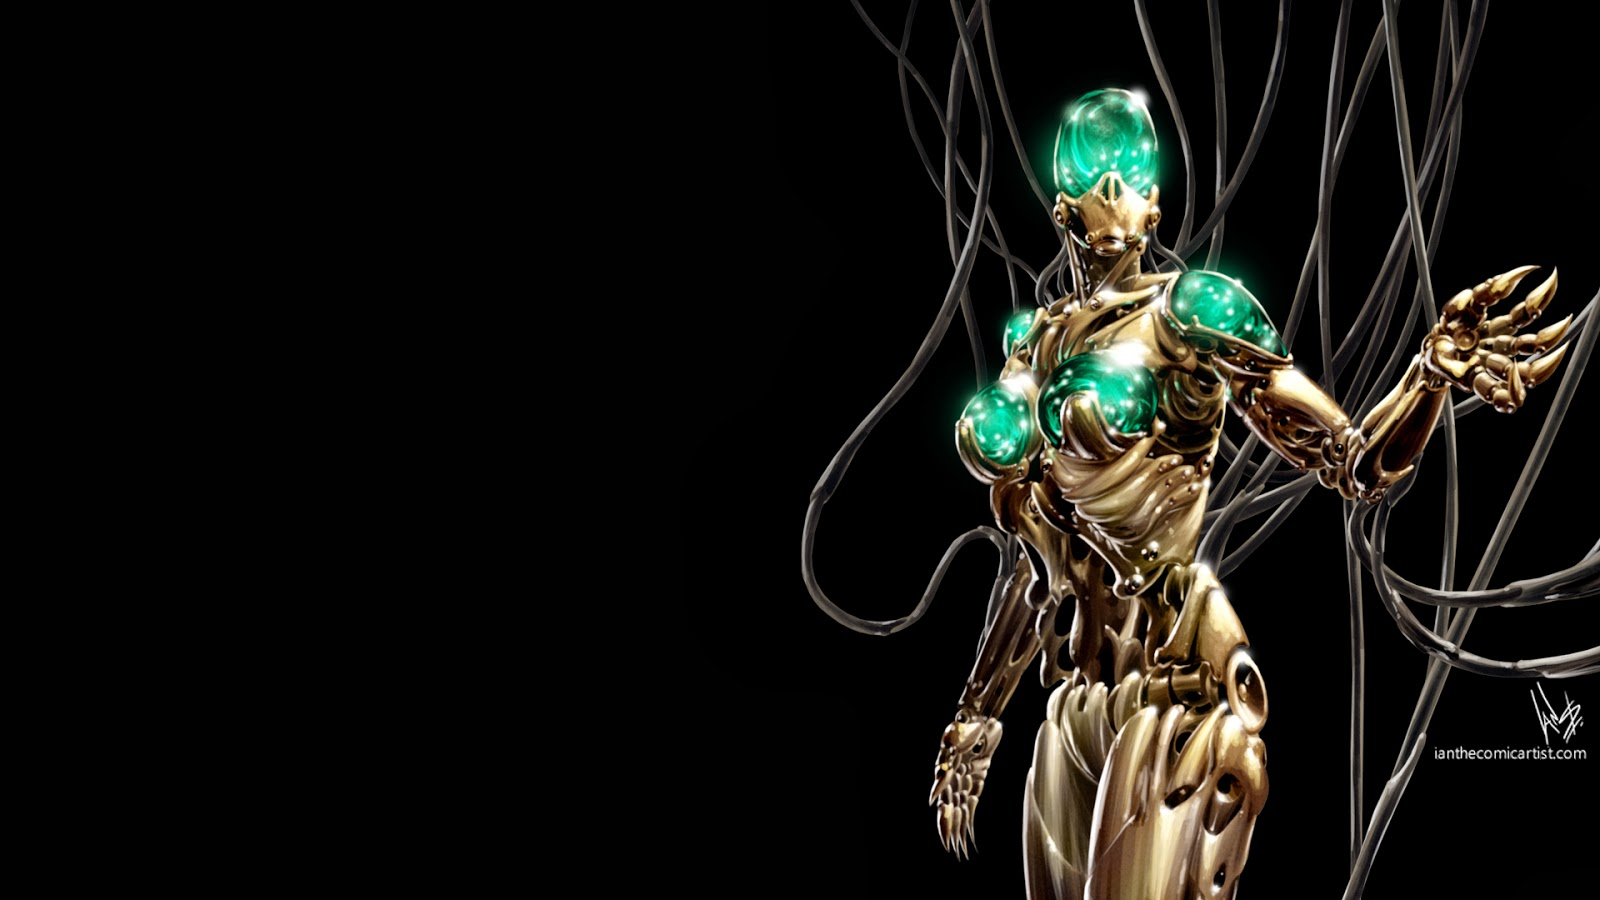 Photography of Ian Sokoliwski Cyberpunk Robot Painting Wallpaper 1600x900